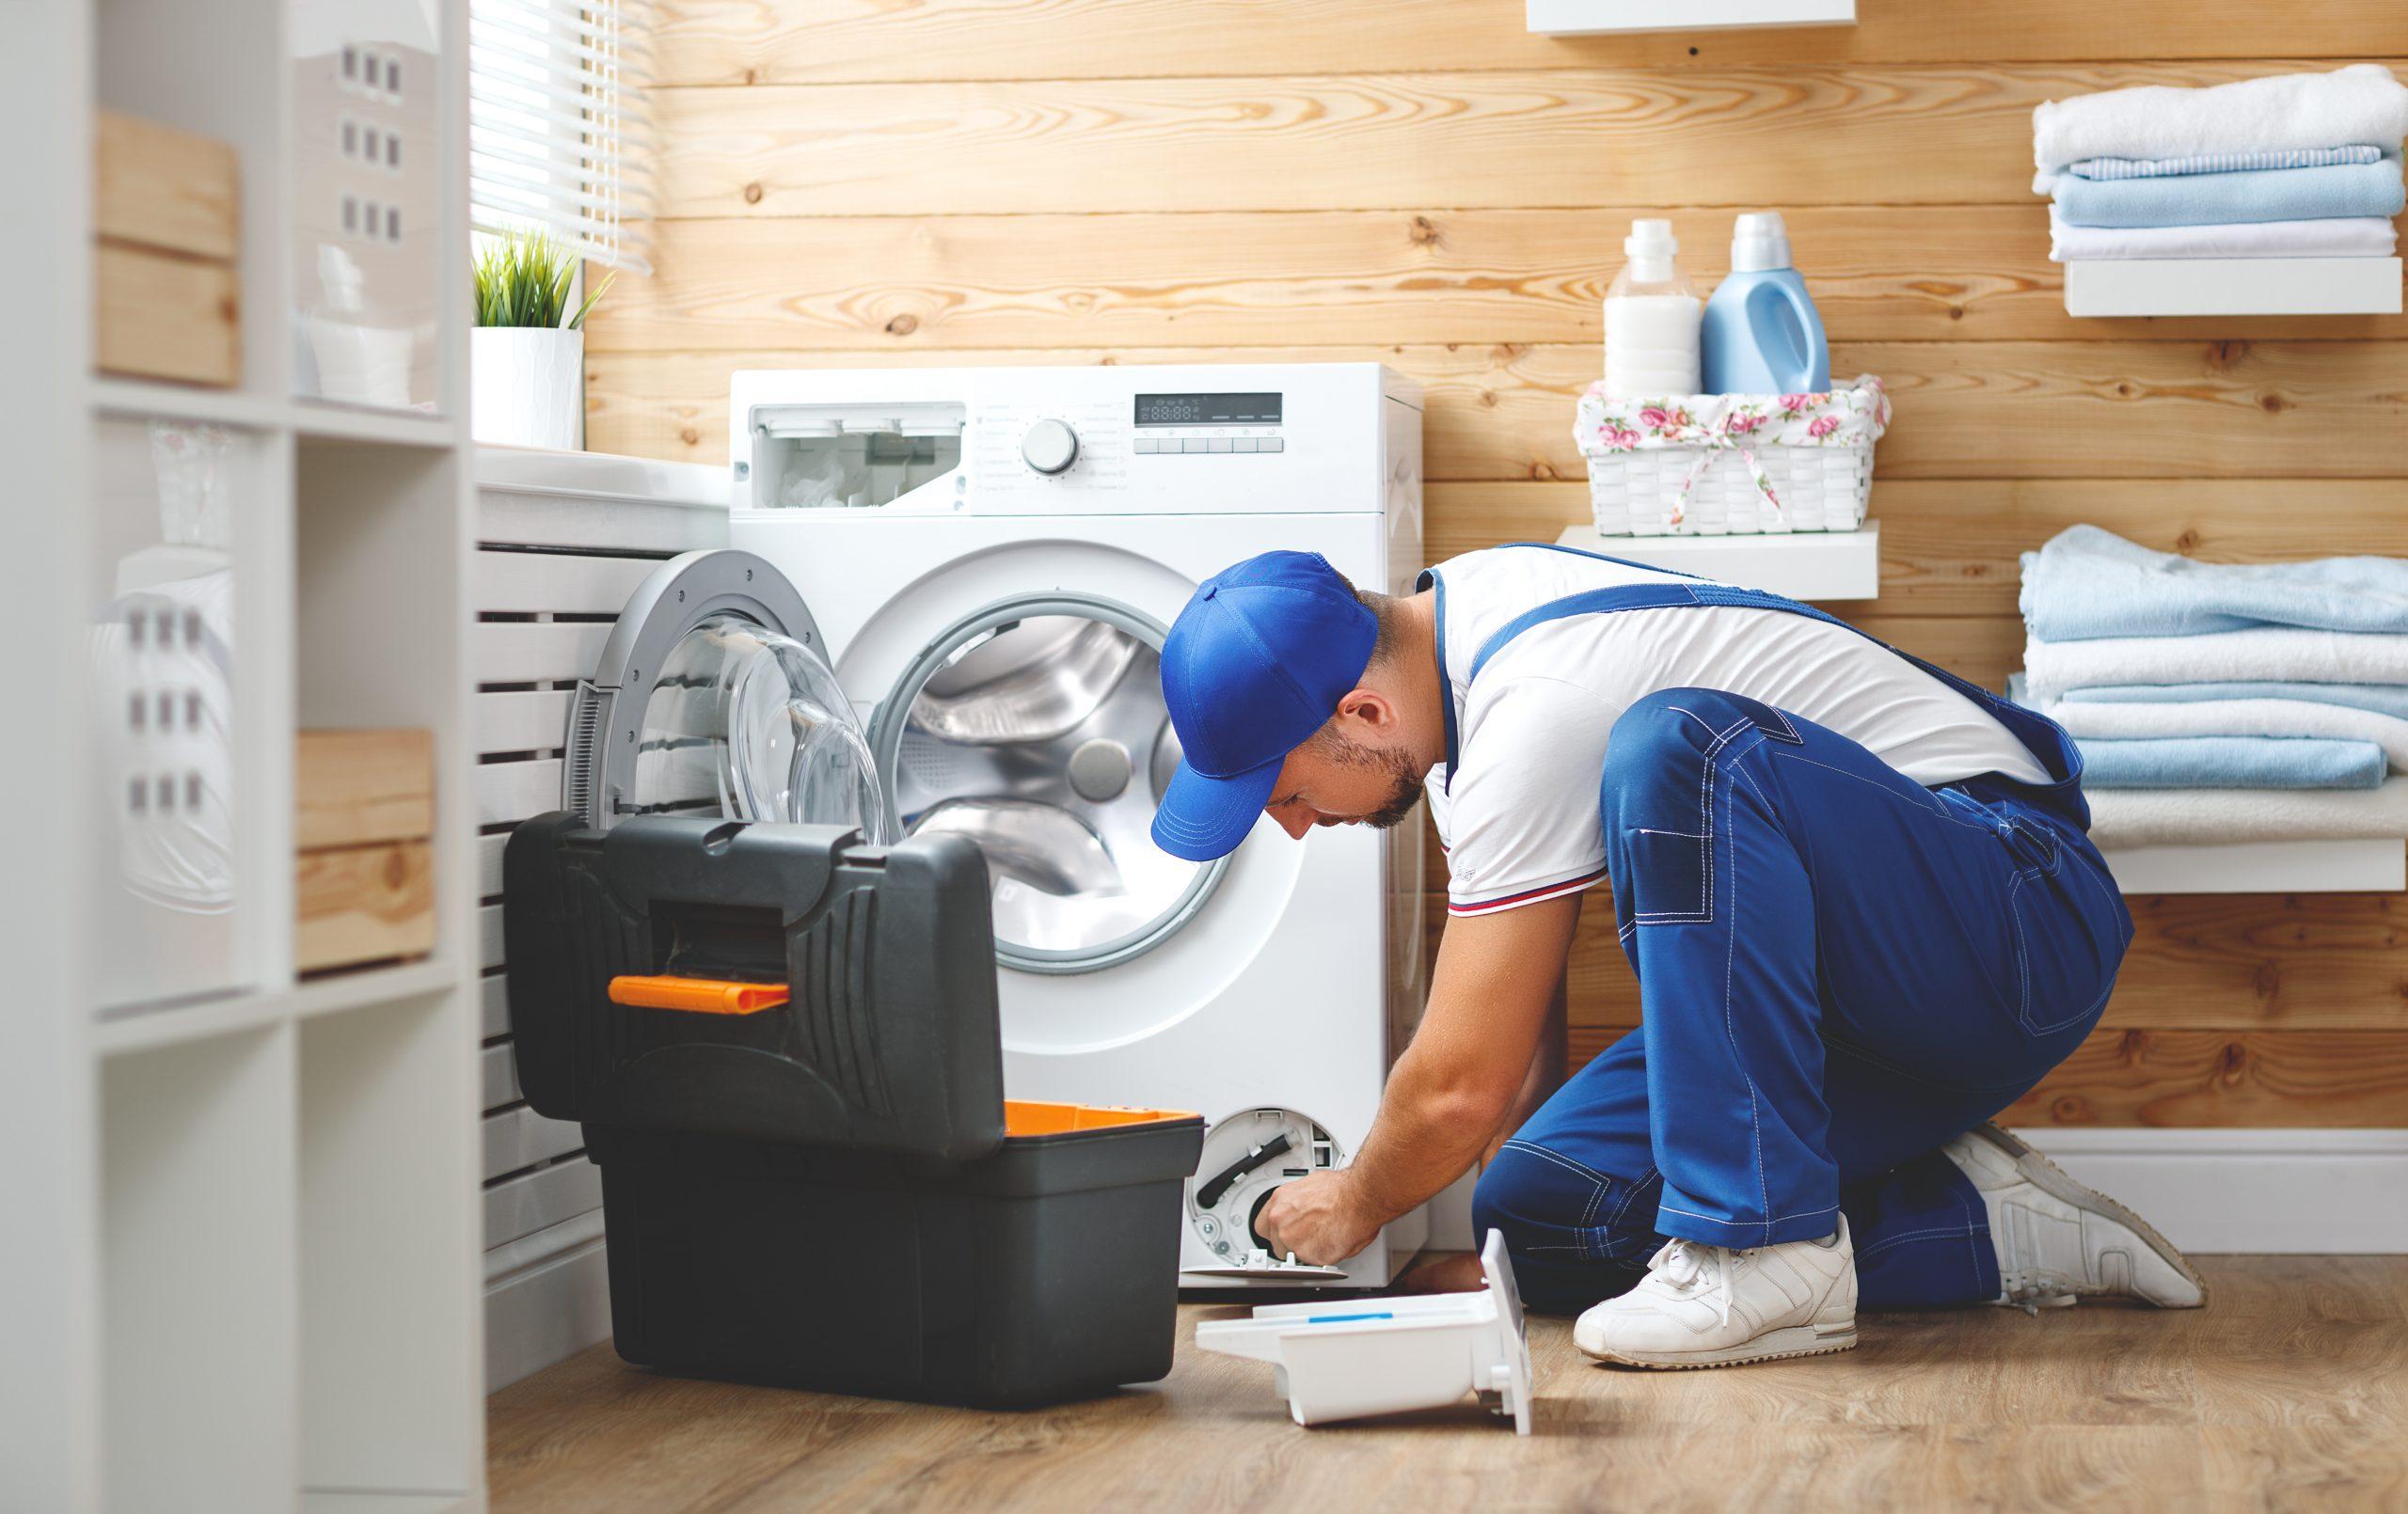 Mann repariert Waschmaschine